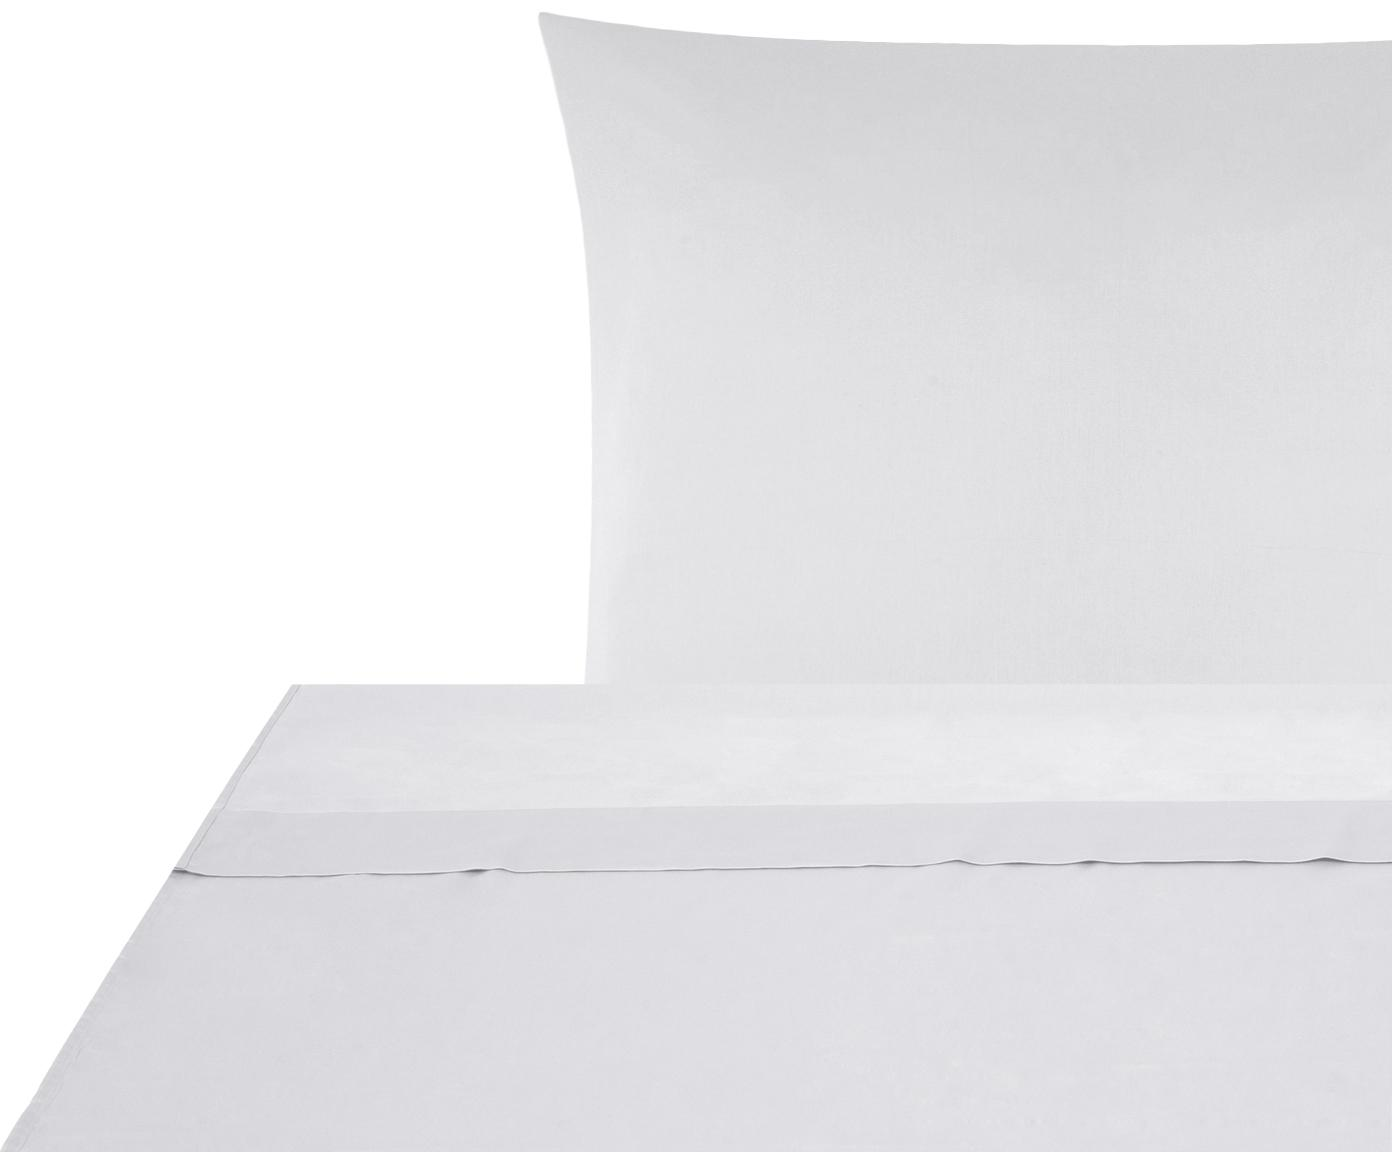 Sábana encimera de satén Comfort, Gris claro, Cama 150/160 cm (240 x 270 cm)